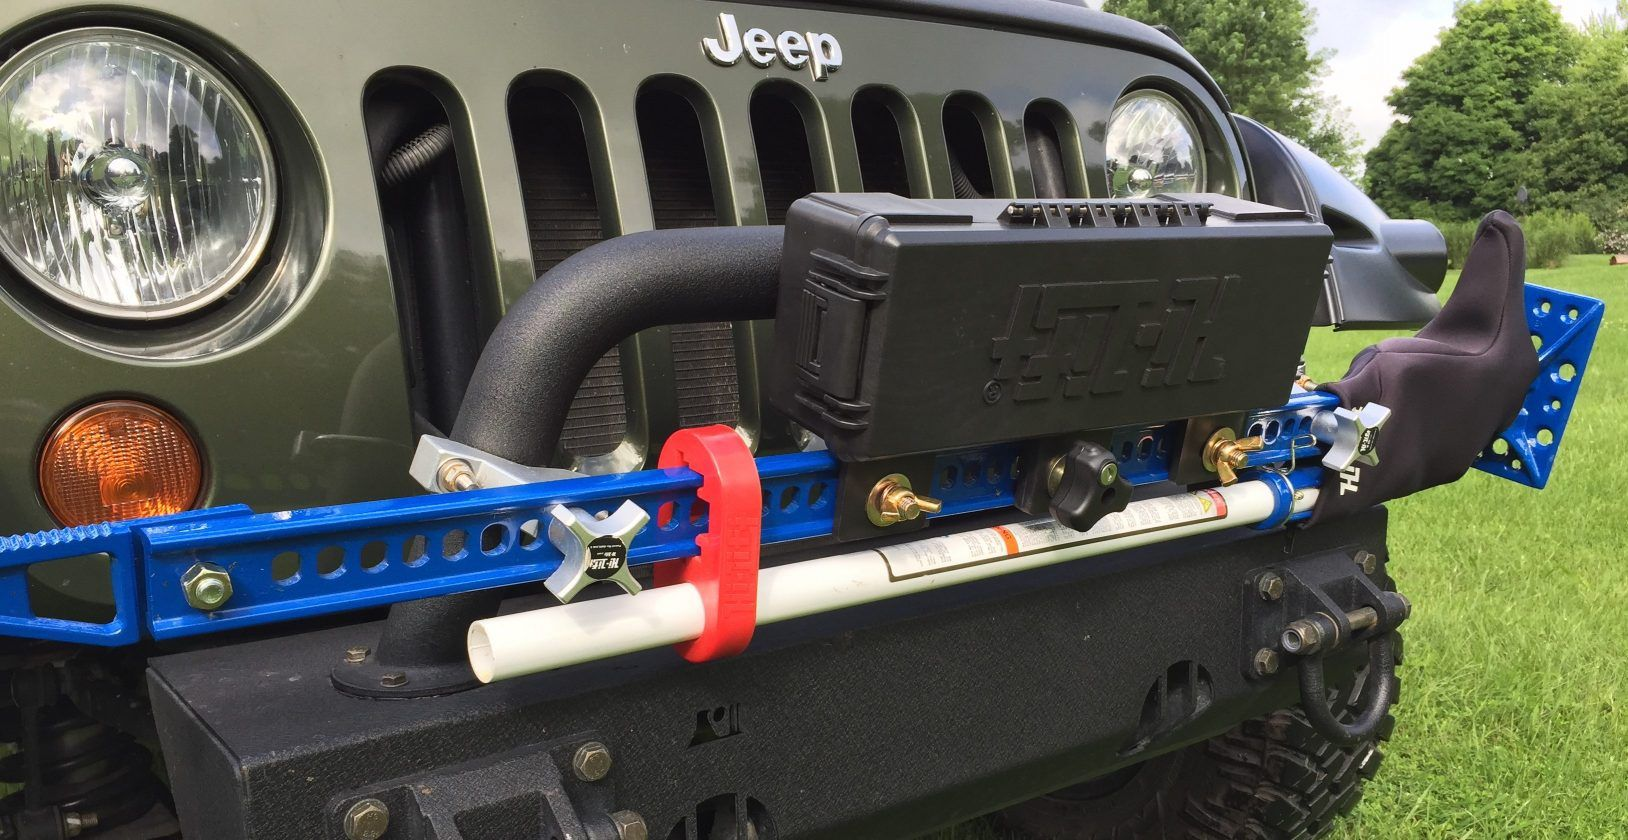 Jack Accessories Hi Lift Jack Co Jeep Life Jeep Jeep Wrangler